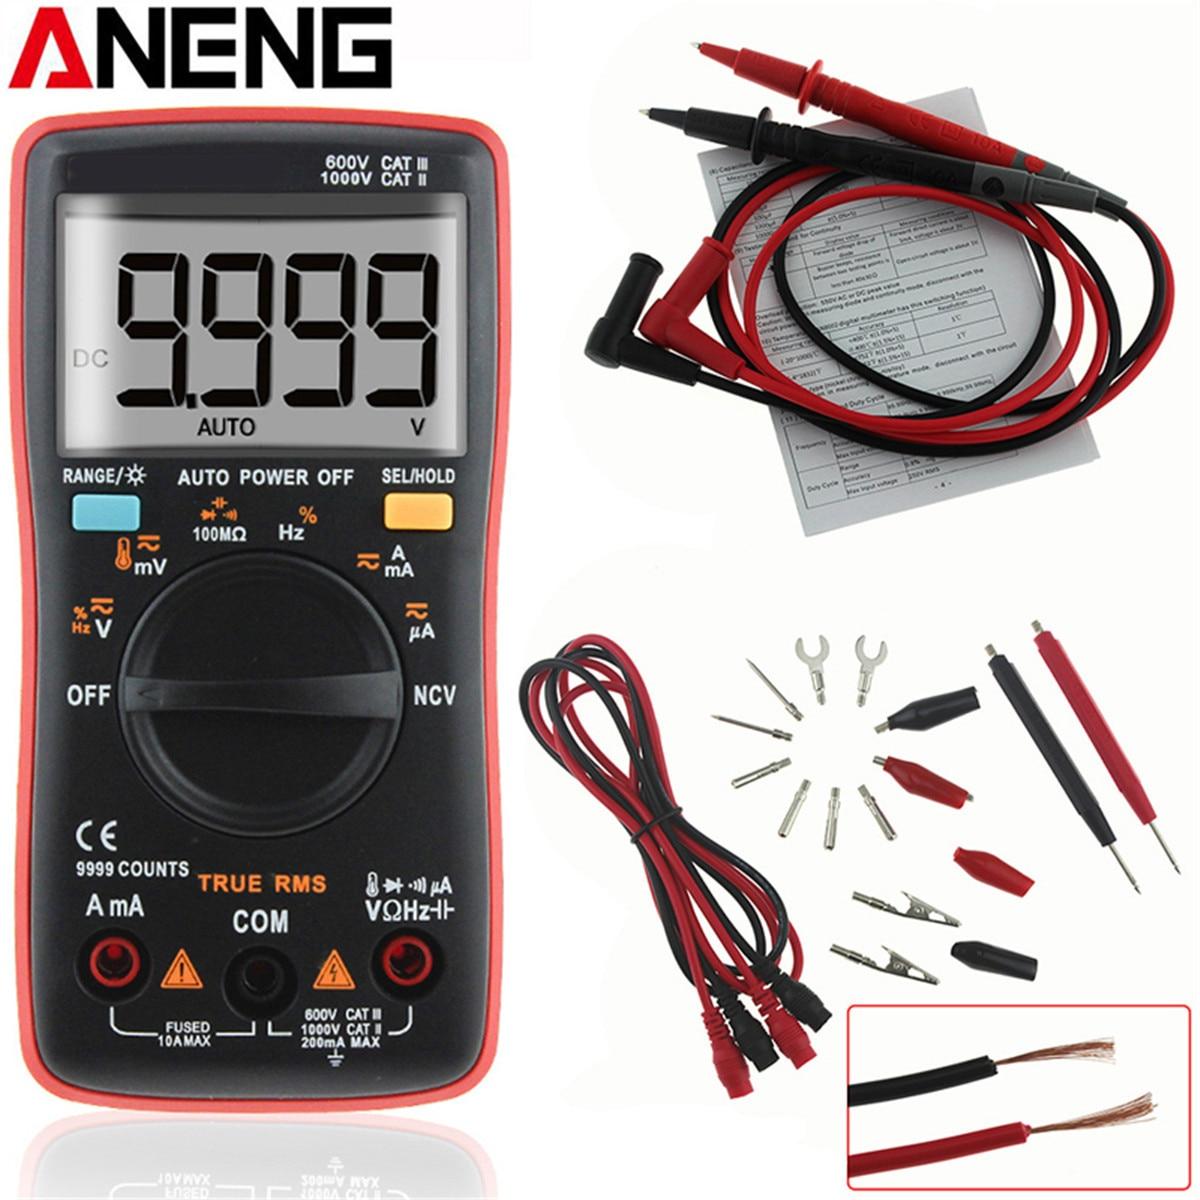 купить ANENG AN8009 Auto Range Digital Multimeter 9999 Counts Backlight AC/DC Ammeter Voltmeter Ohm Transistor Tester Multi Meter по цене 1542.5 рублей